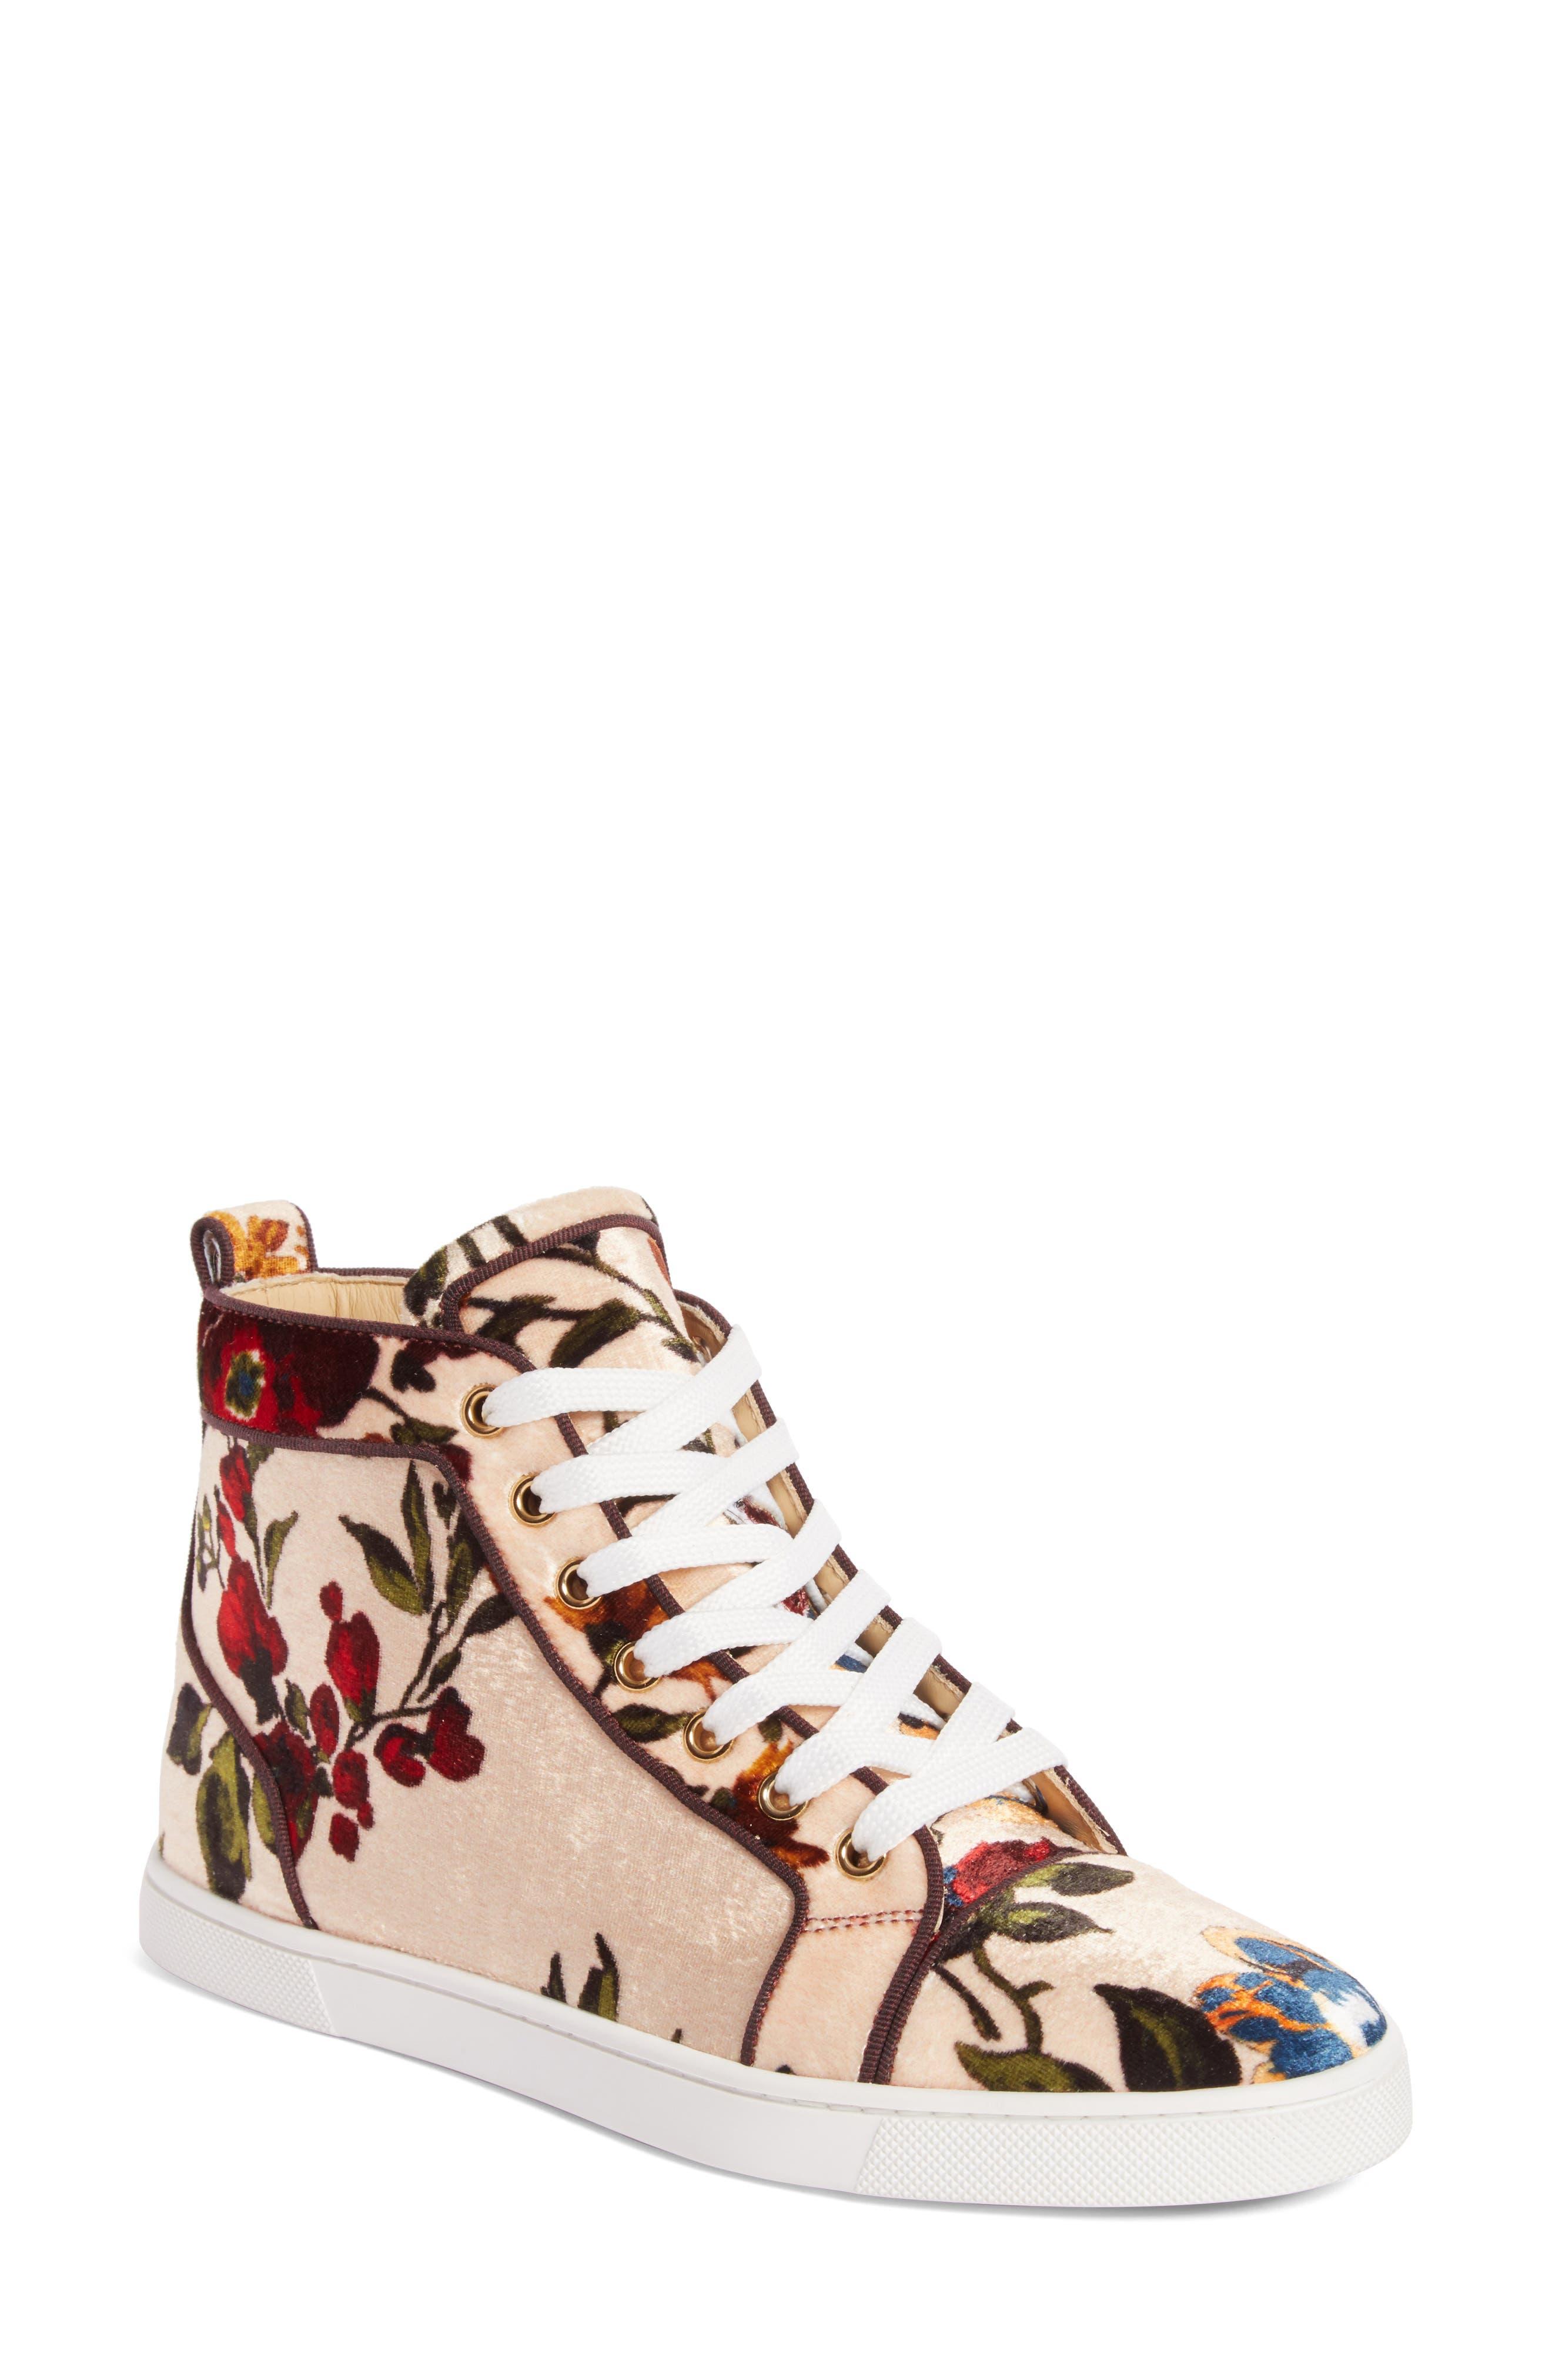 CHRISTIAN LOUBOUTIN,                             Bip Bip Floral Sneaker,                             Main thumbnail 1, color,                             250